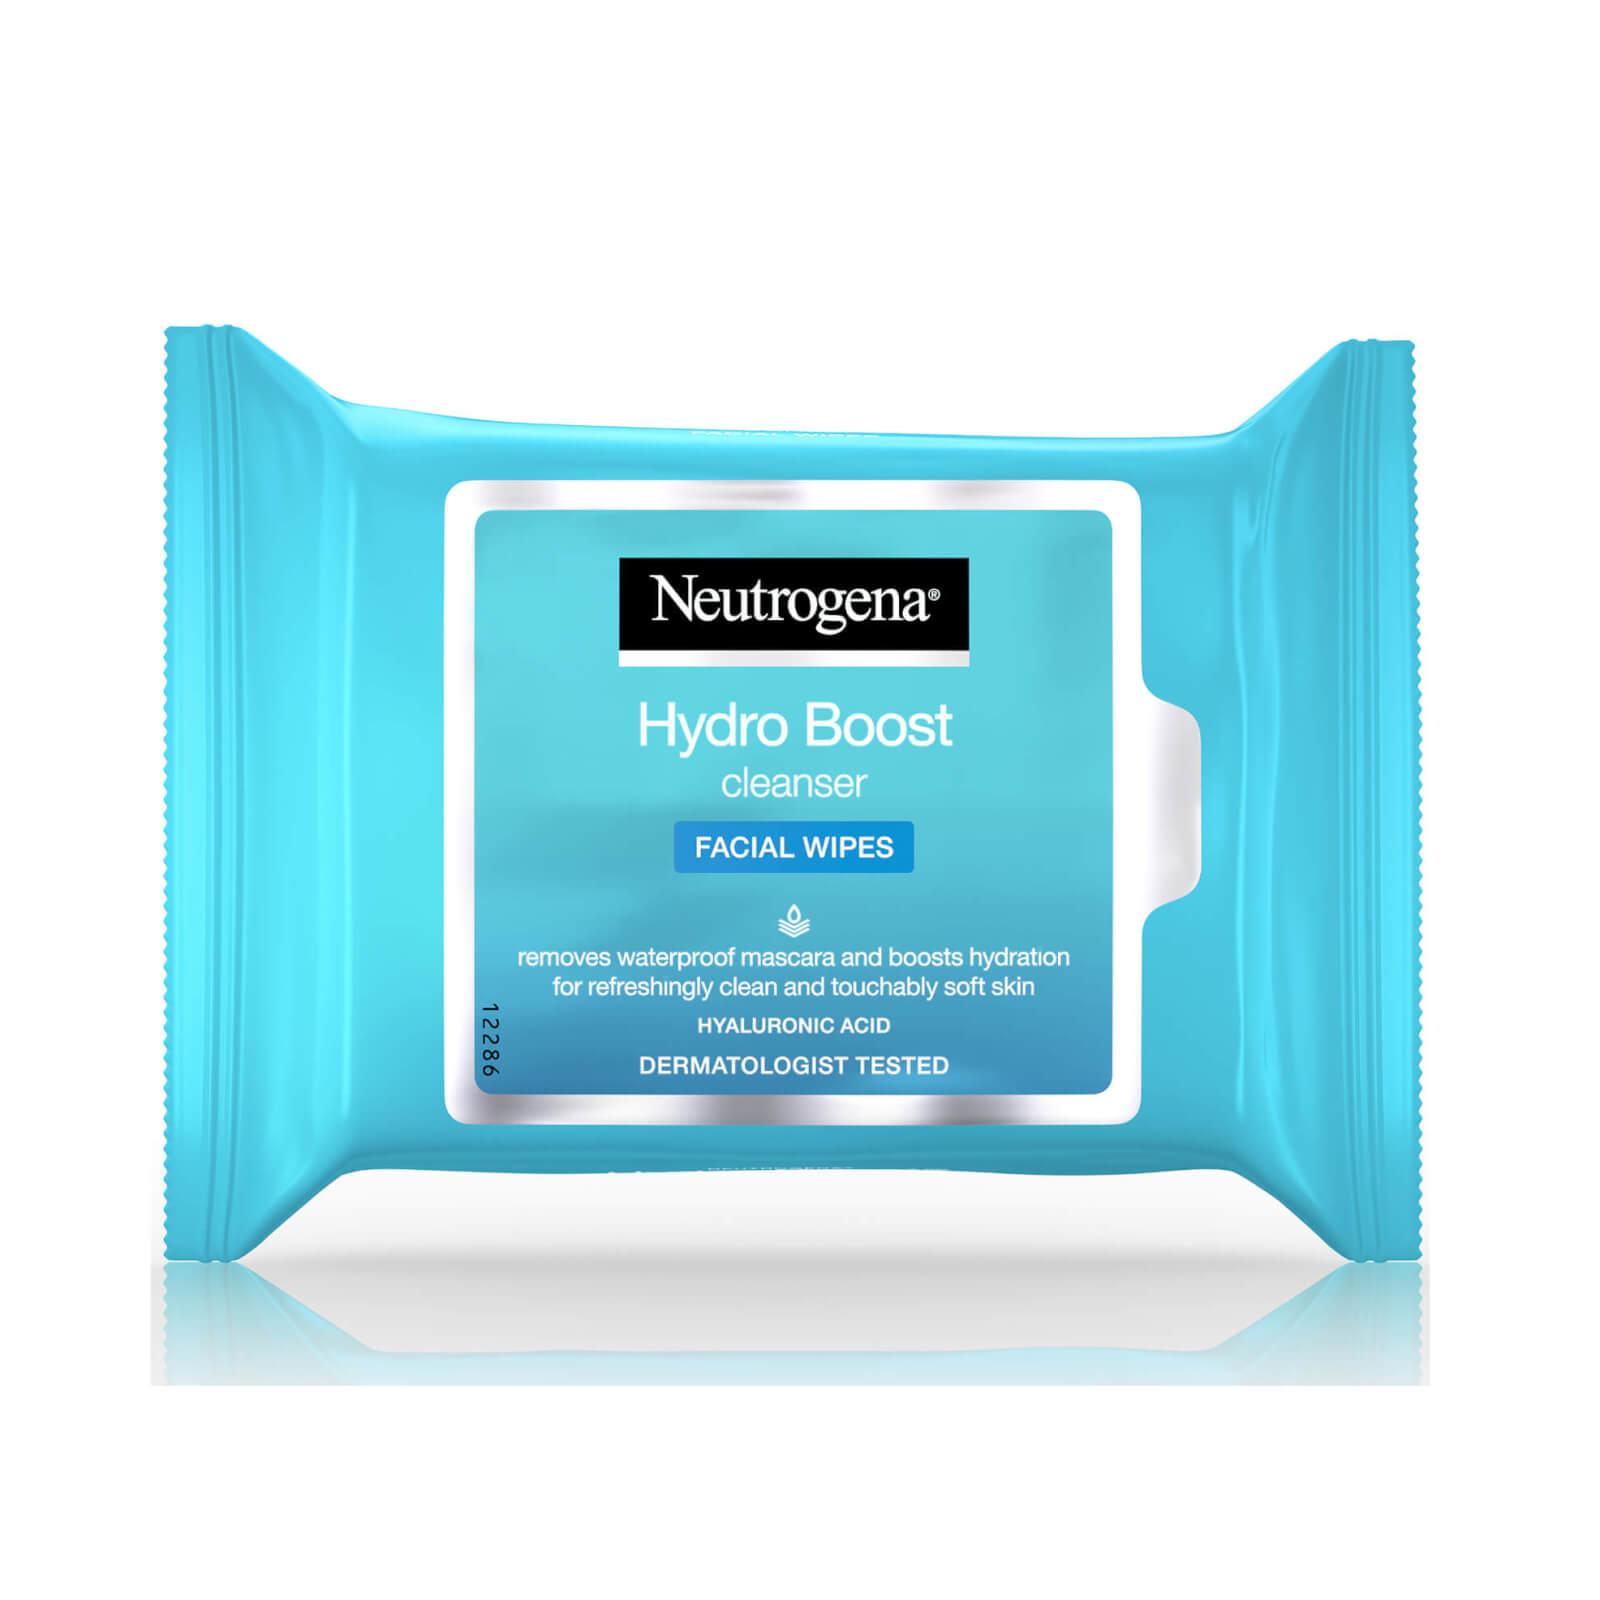 Купить Очищающие салфетки Neutrogena Hydroboost Cleanser Wipes (25 салфеток)